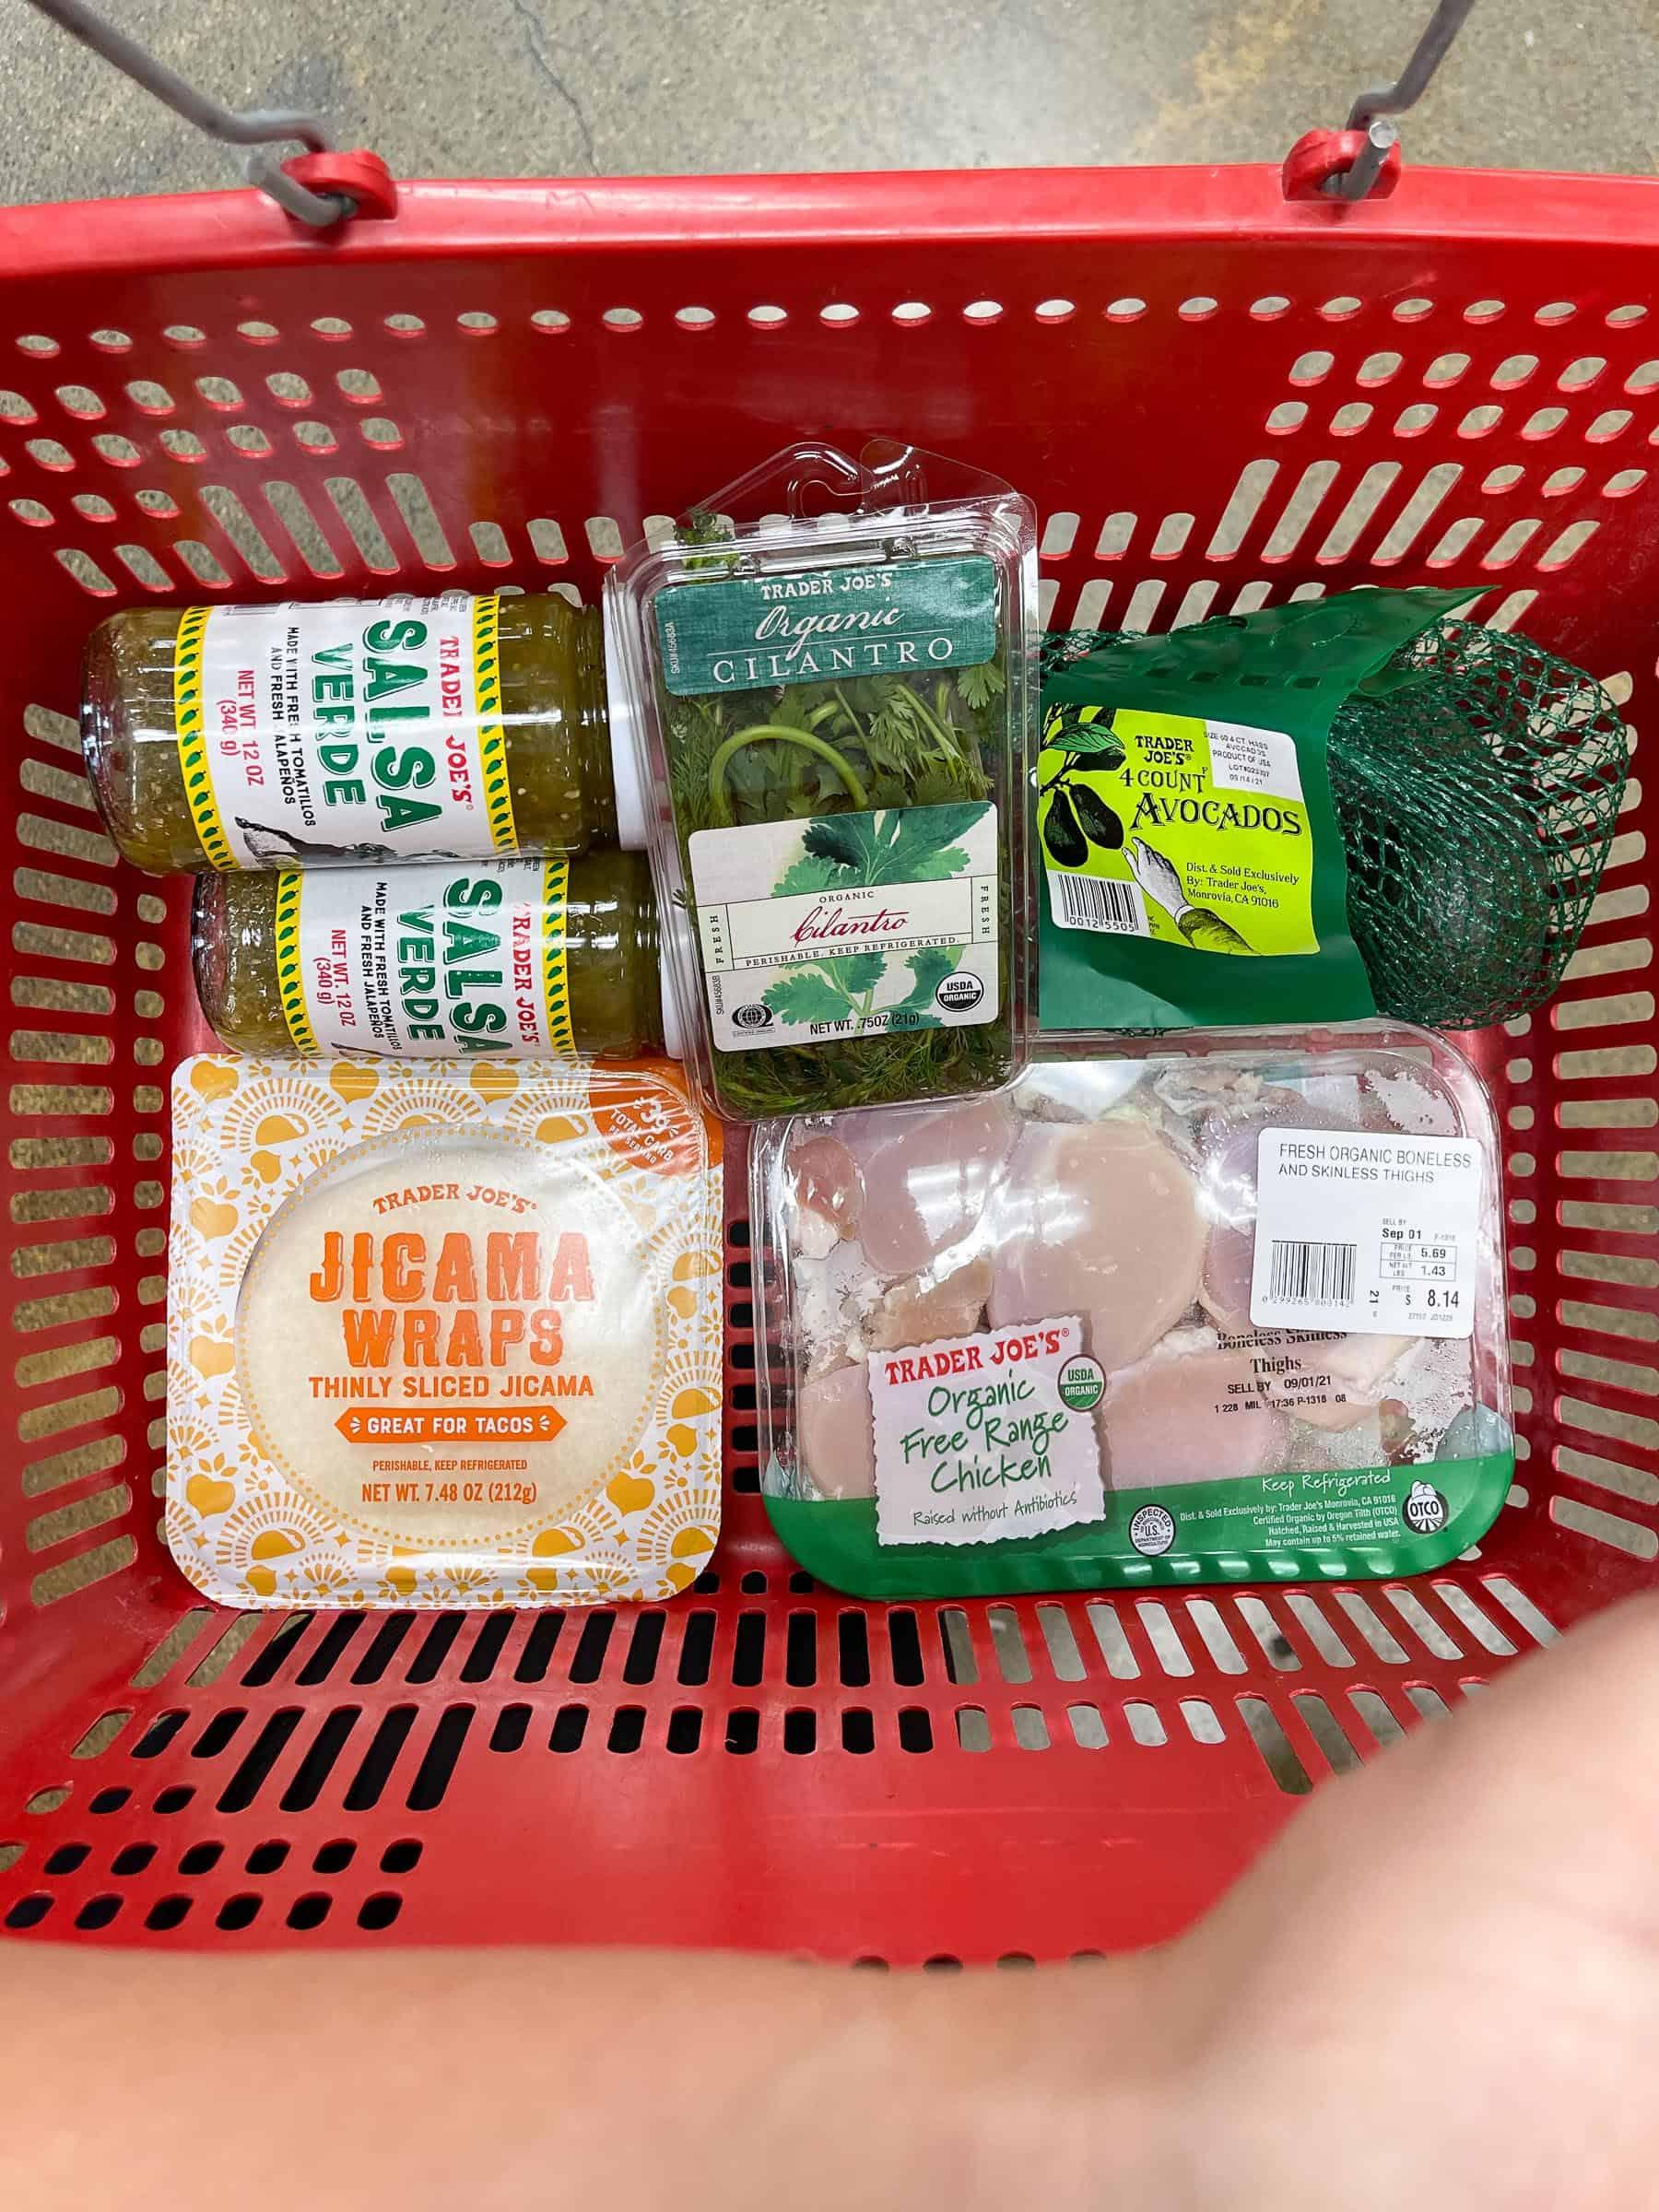 red trader joe's shopping basket with ingredients for keto crispy verde tacos